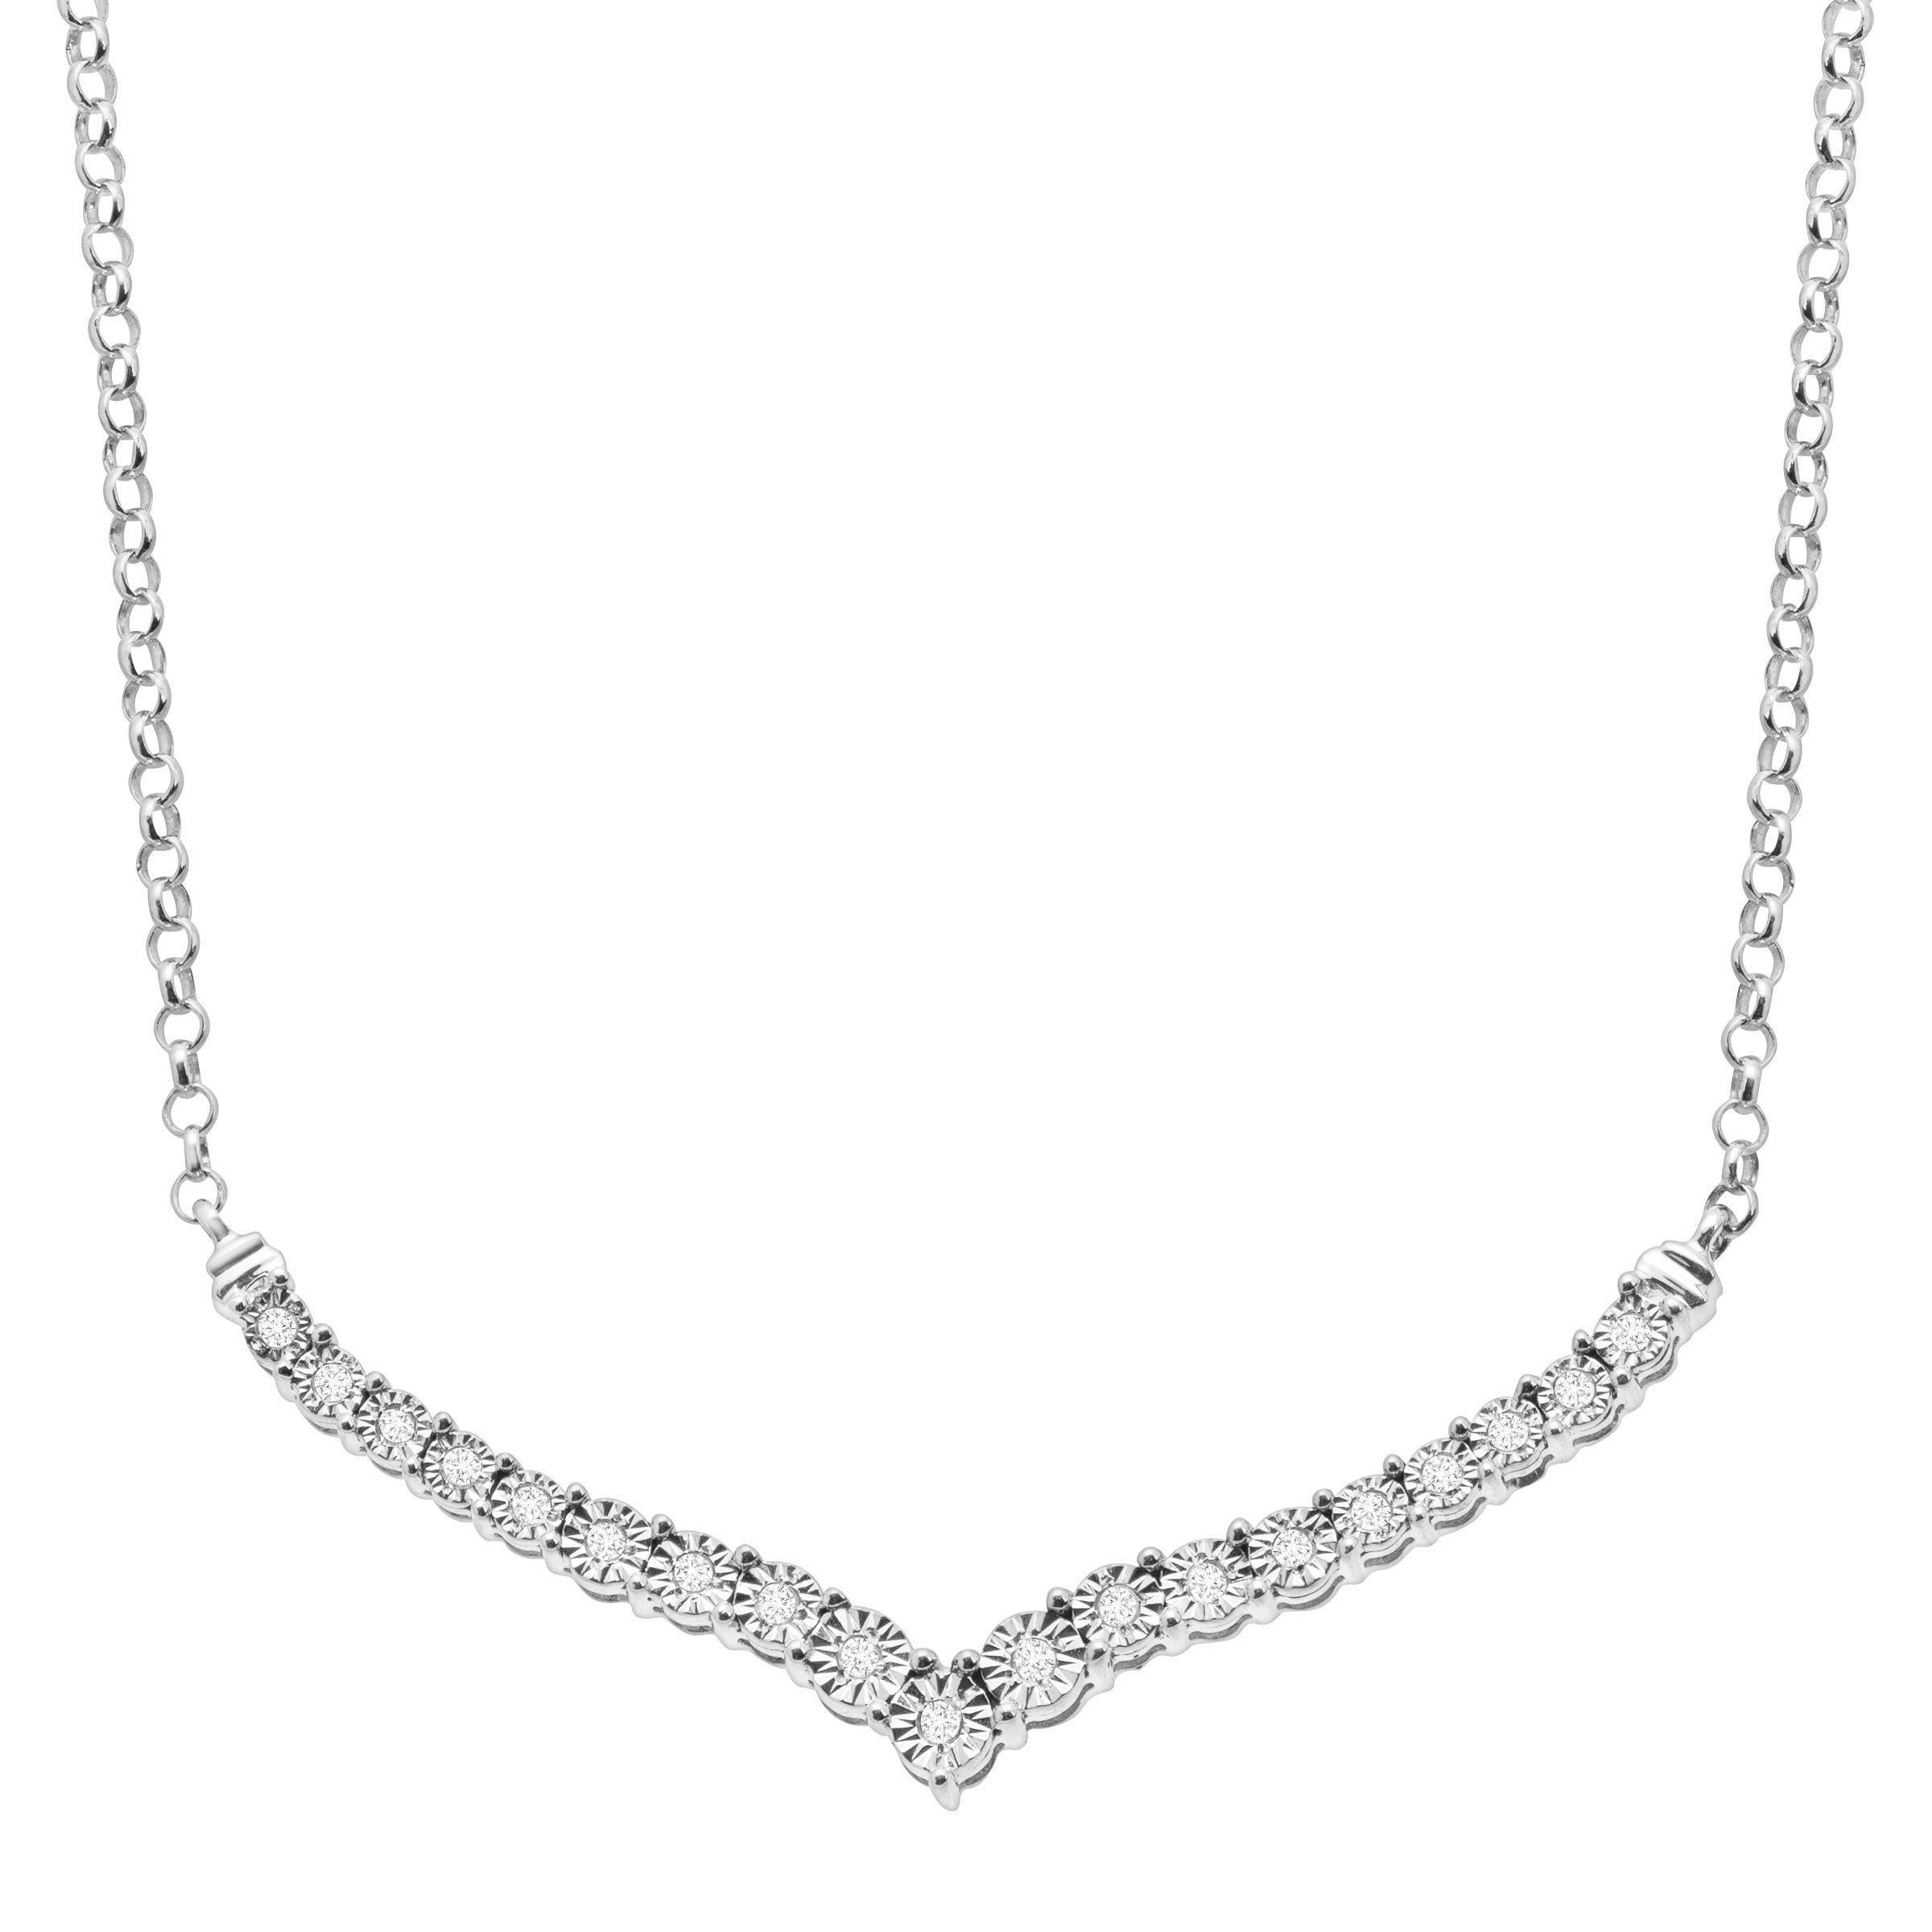 1 4 ct Diamond Chevron Necklace in Sterling Silver 749165221010  804659bd00